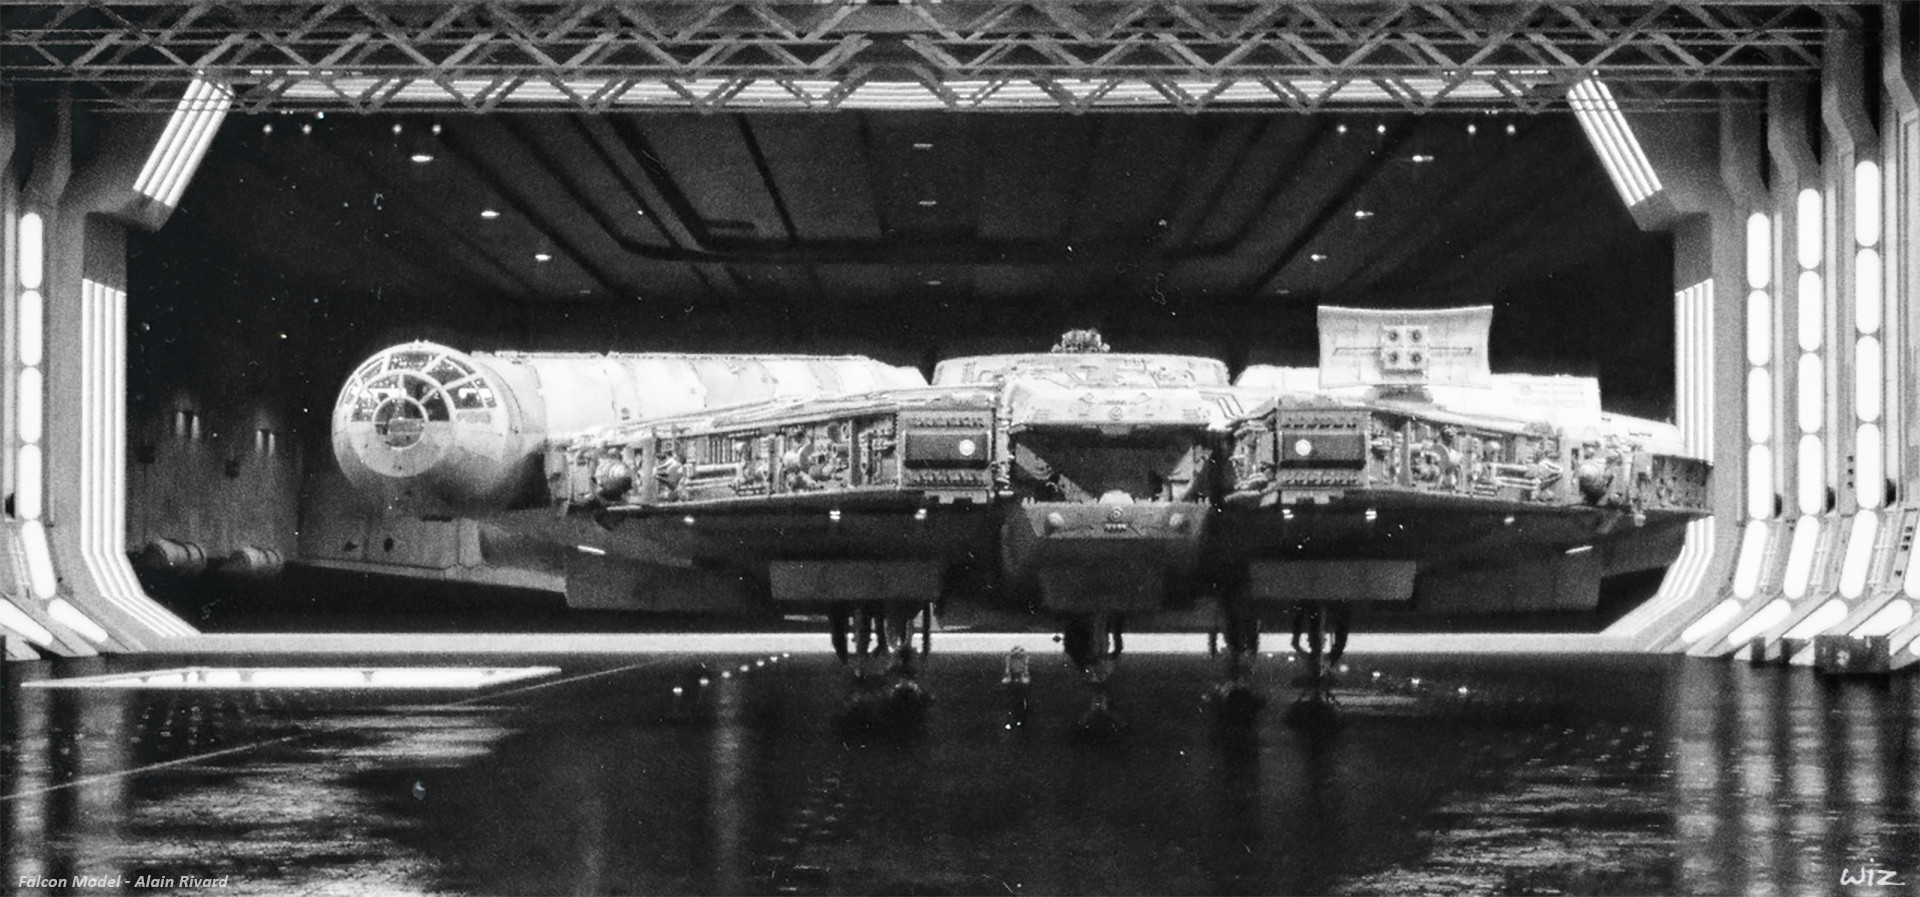 Paul wiz johnson vintage falcon hangar